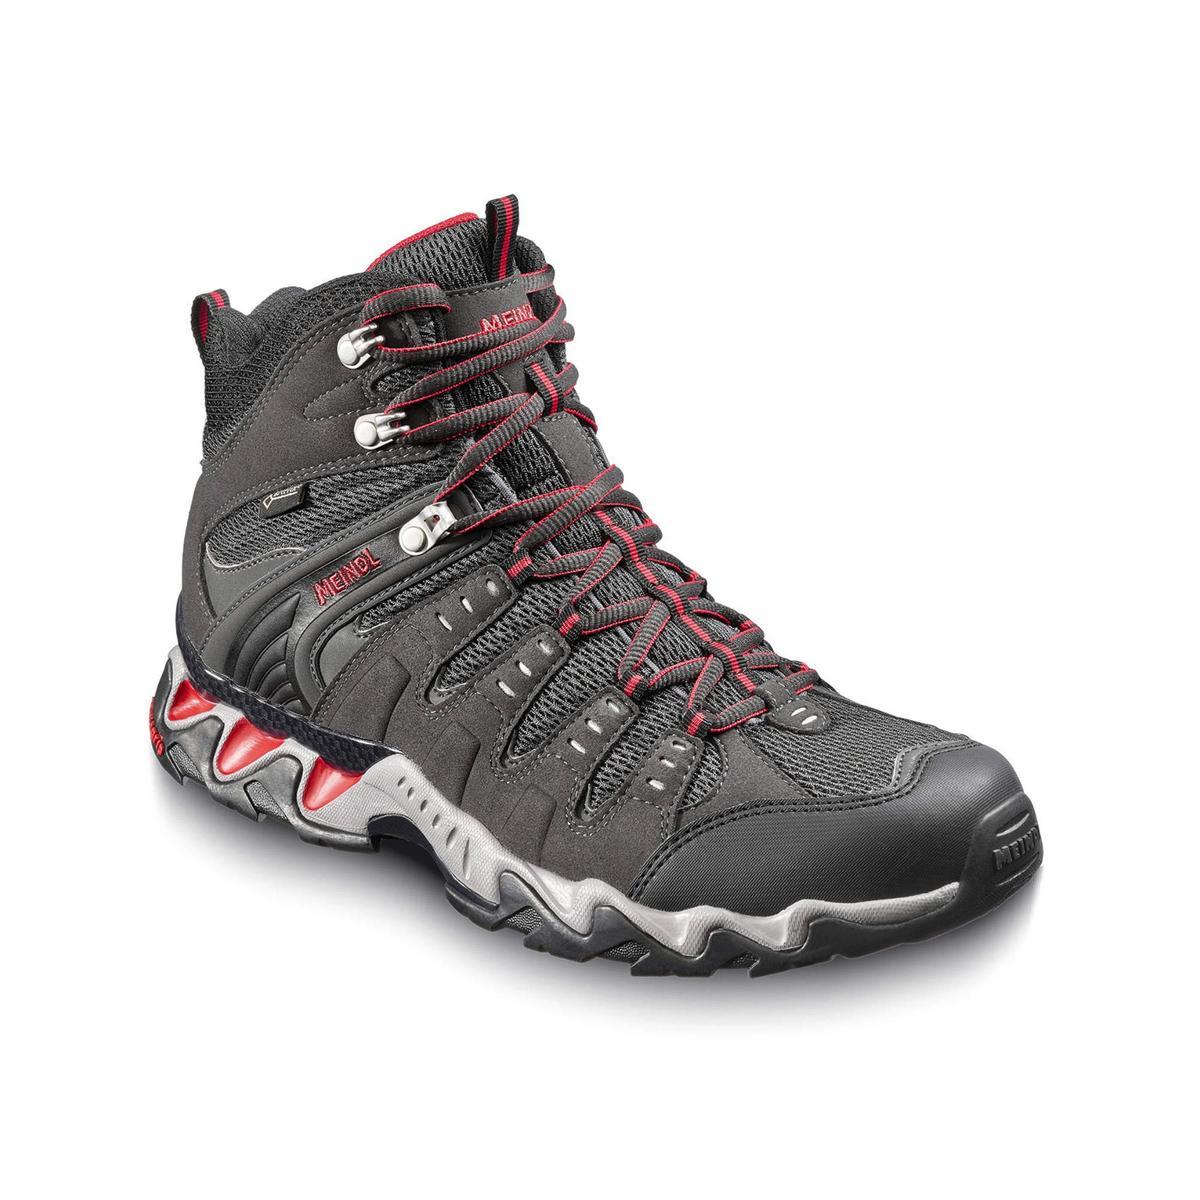 Meindl Men's Respond Mid GORE-TEX Walking Boot - Graphit Rot